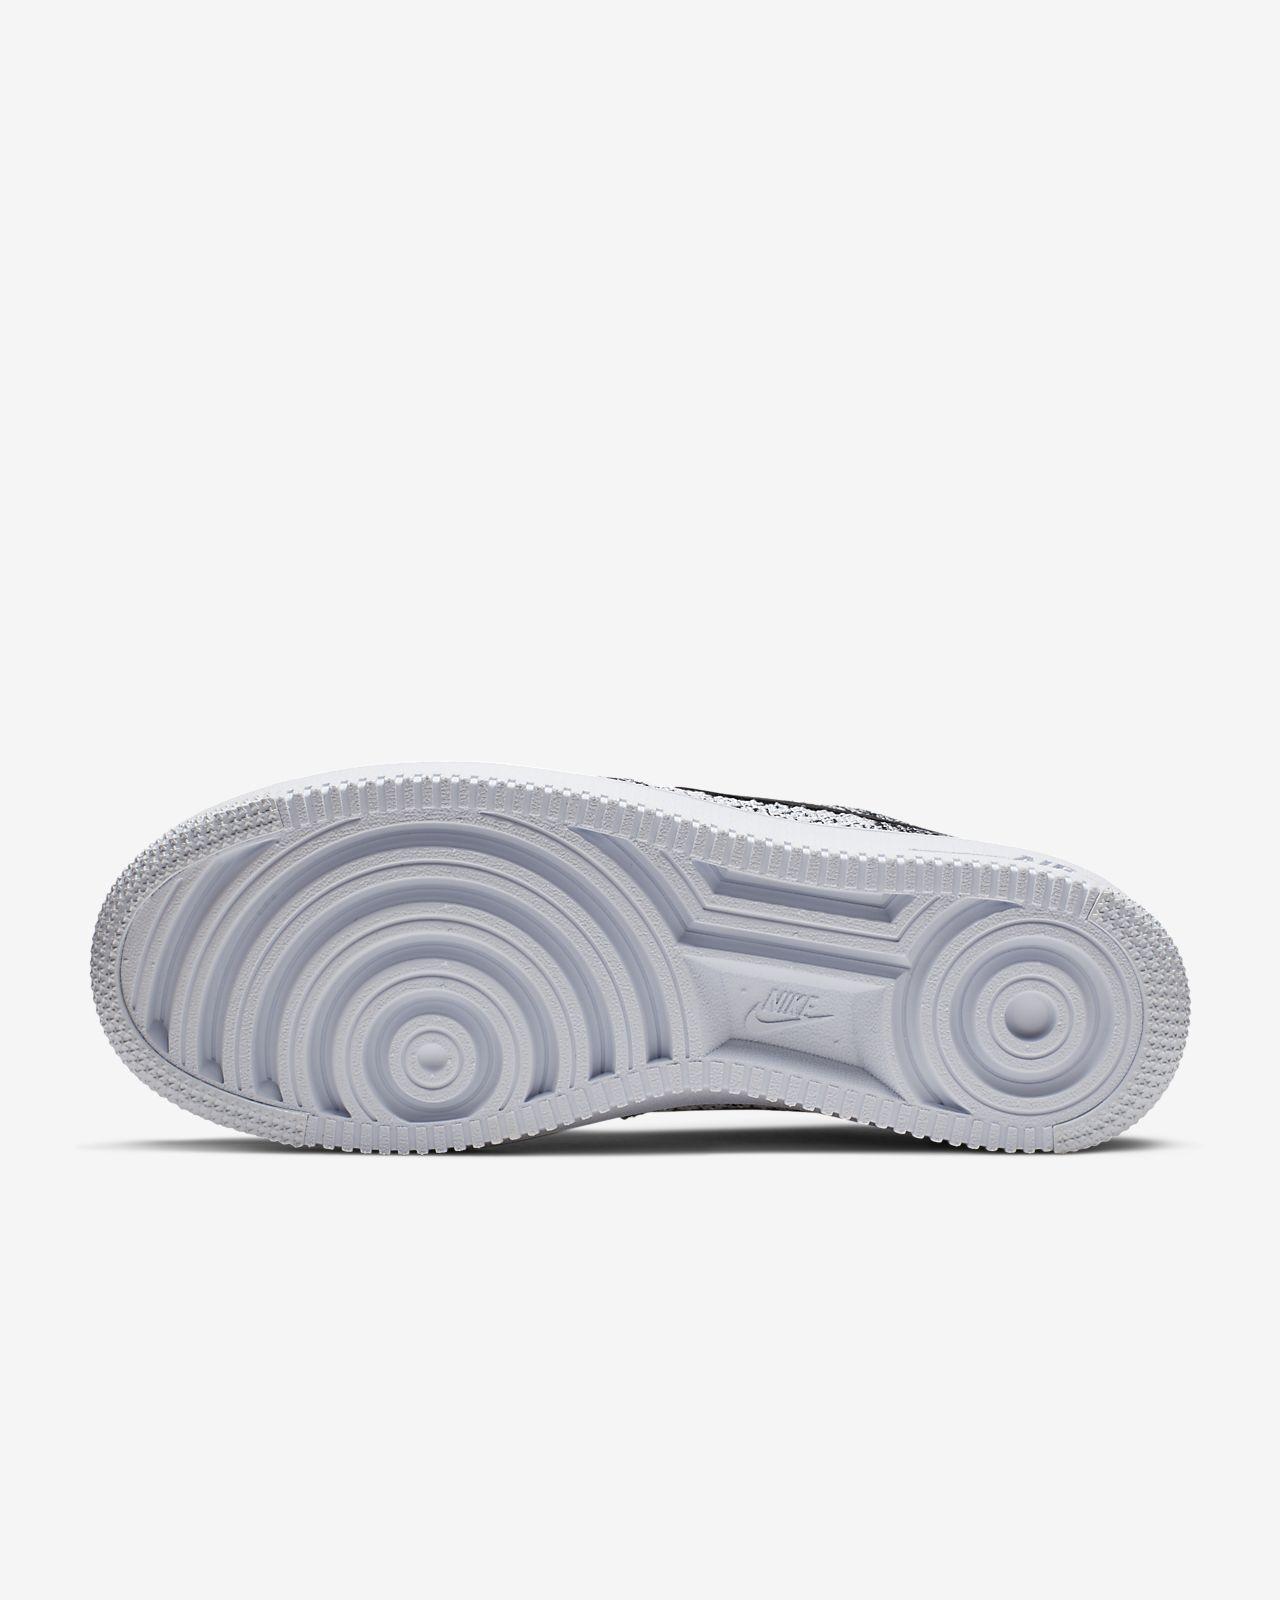 Schuhe Gr 27 Adidas Mädchen Kinder QdsrBthCx